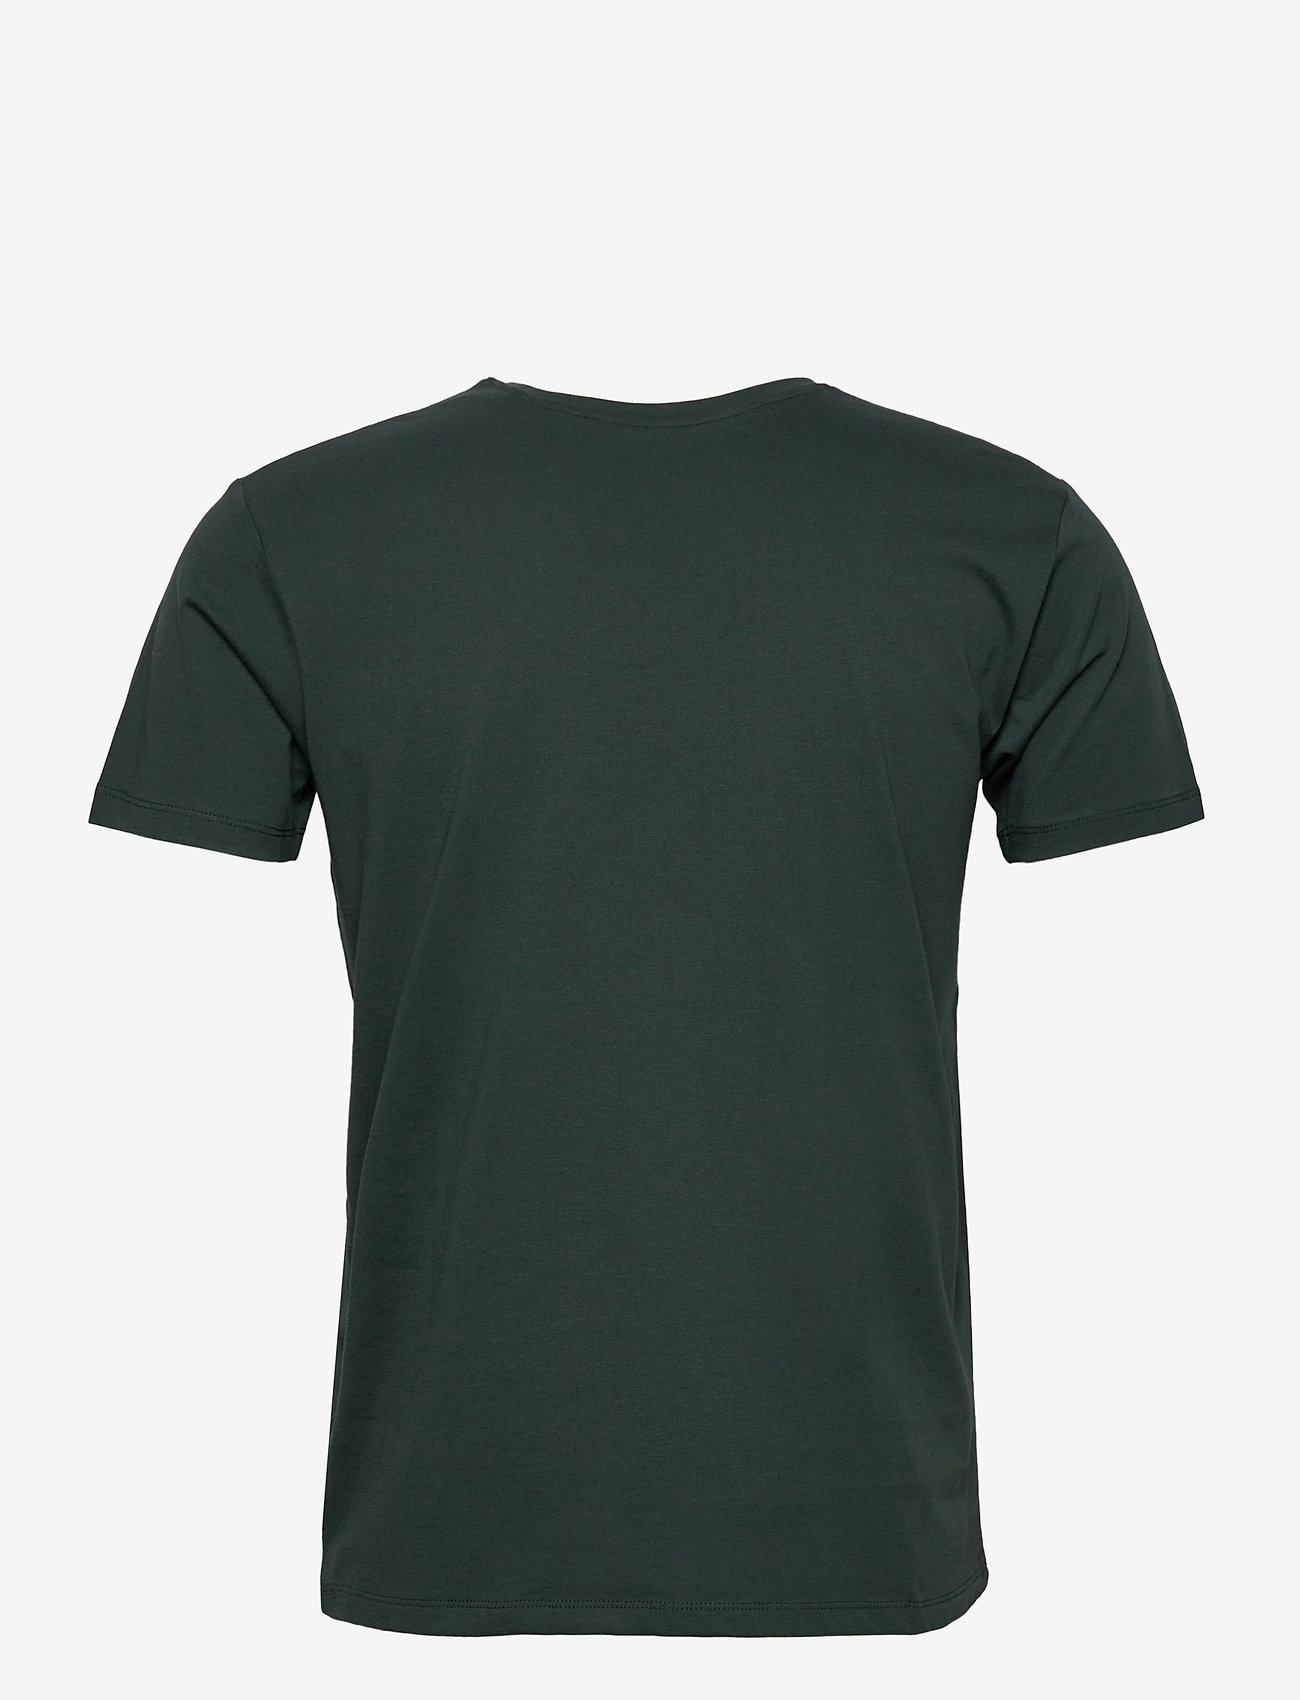 Esprit Casual - T-Shirts - basic t-shirts - teal blue - 1